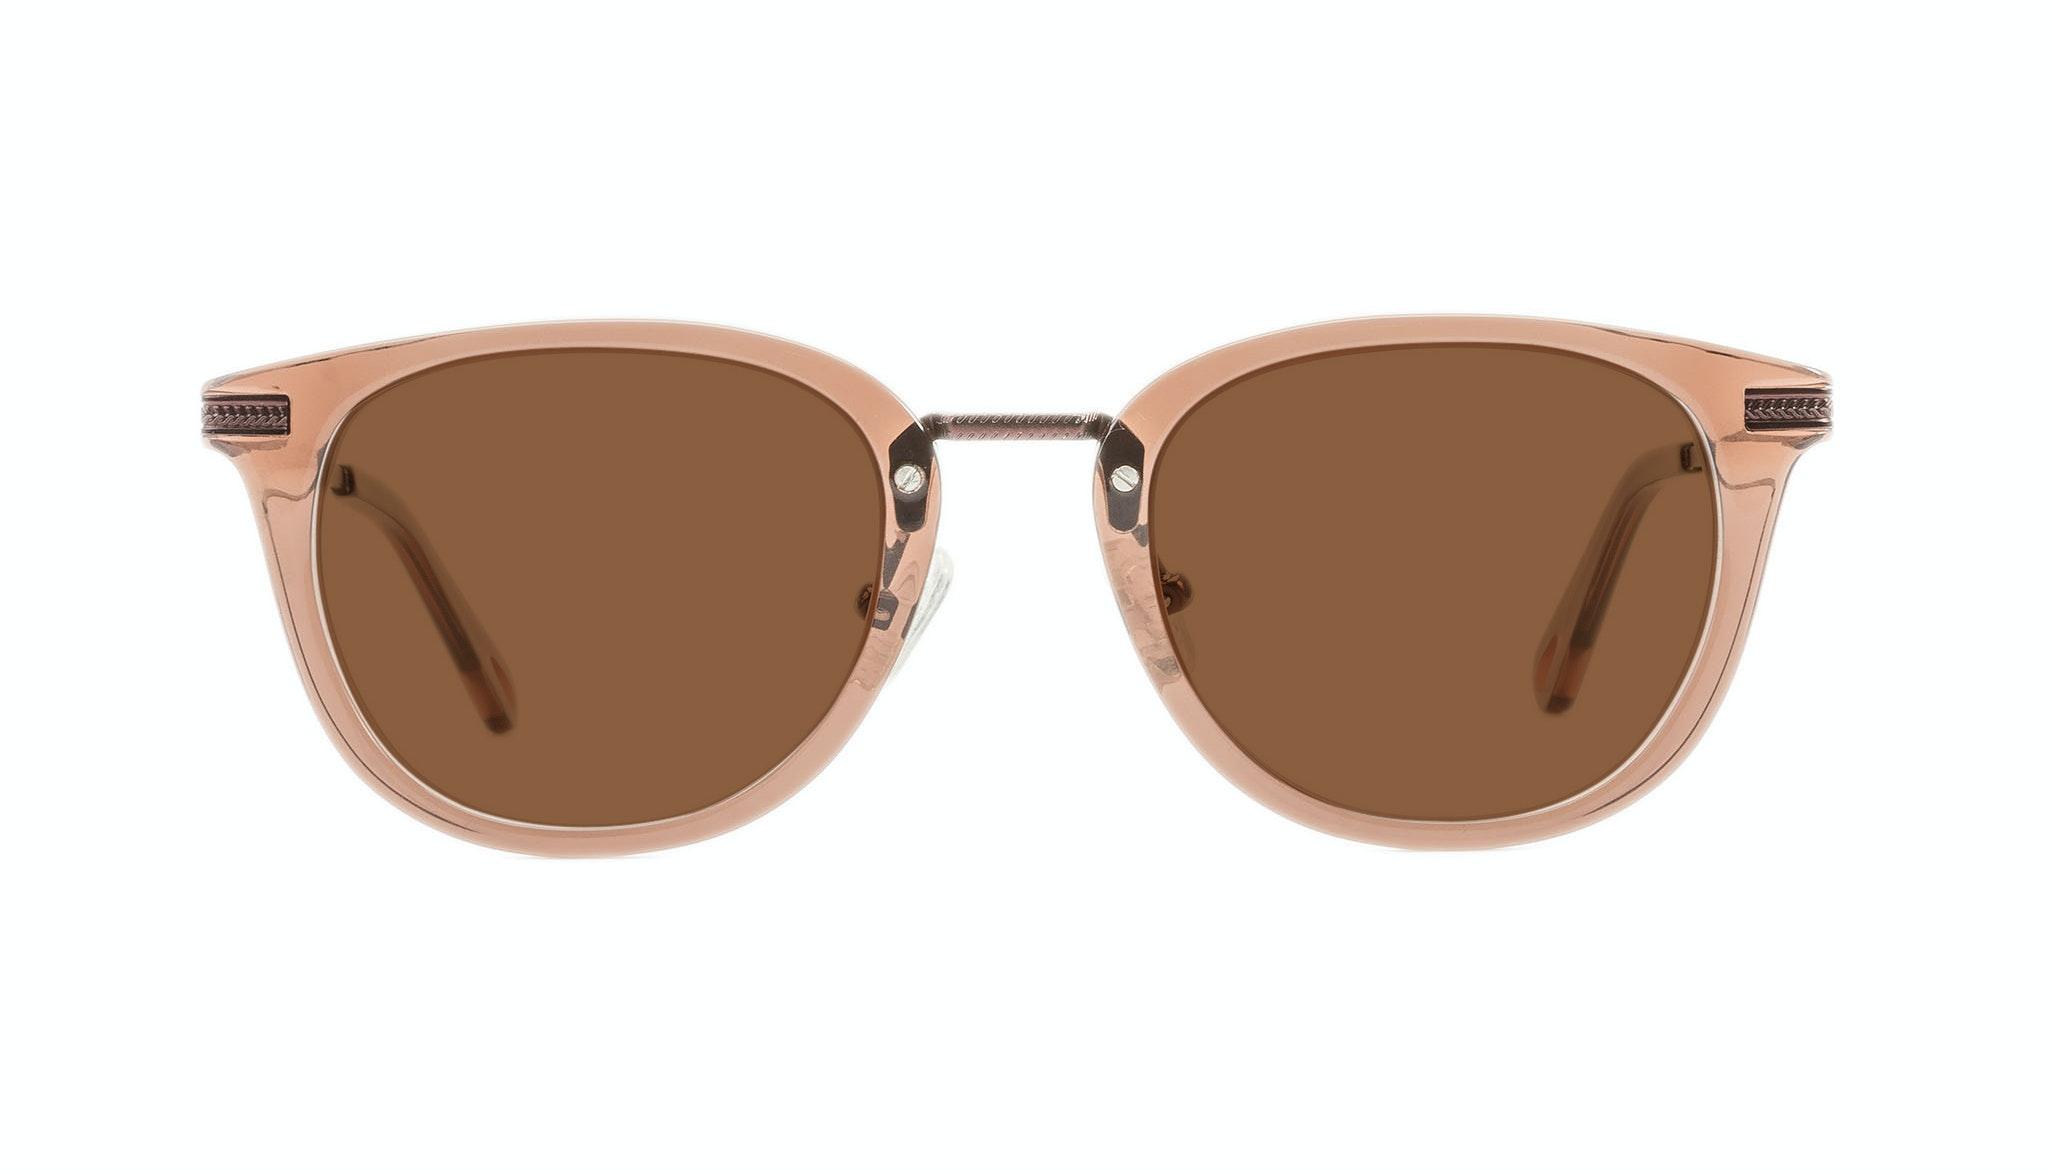 Affordable Fashion Glasses Rectangle Square Sunglasses Men Street Soul Chestnut